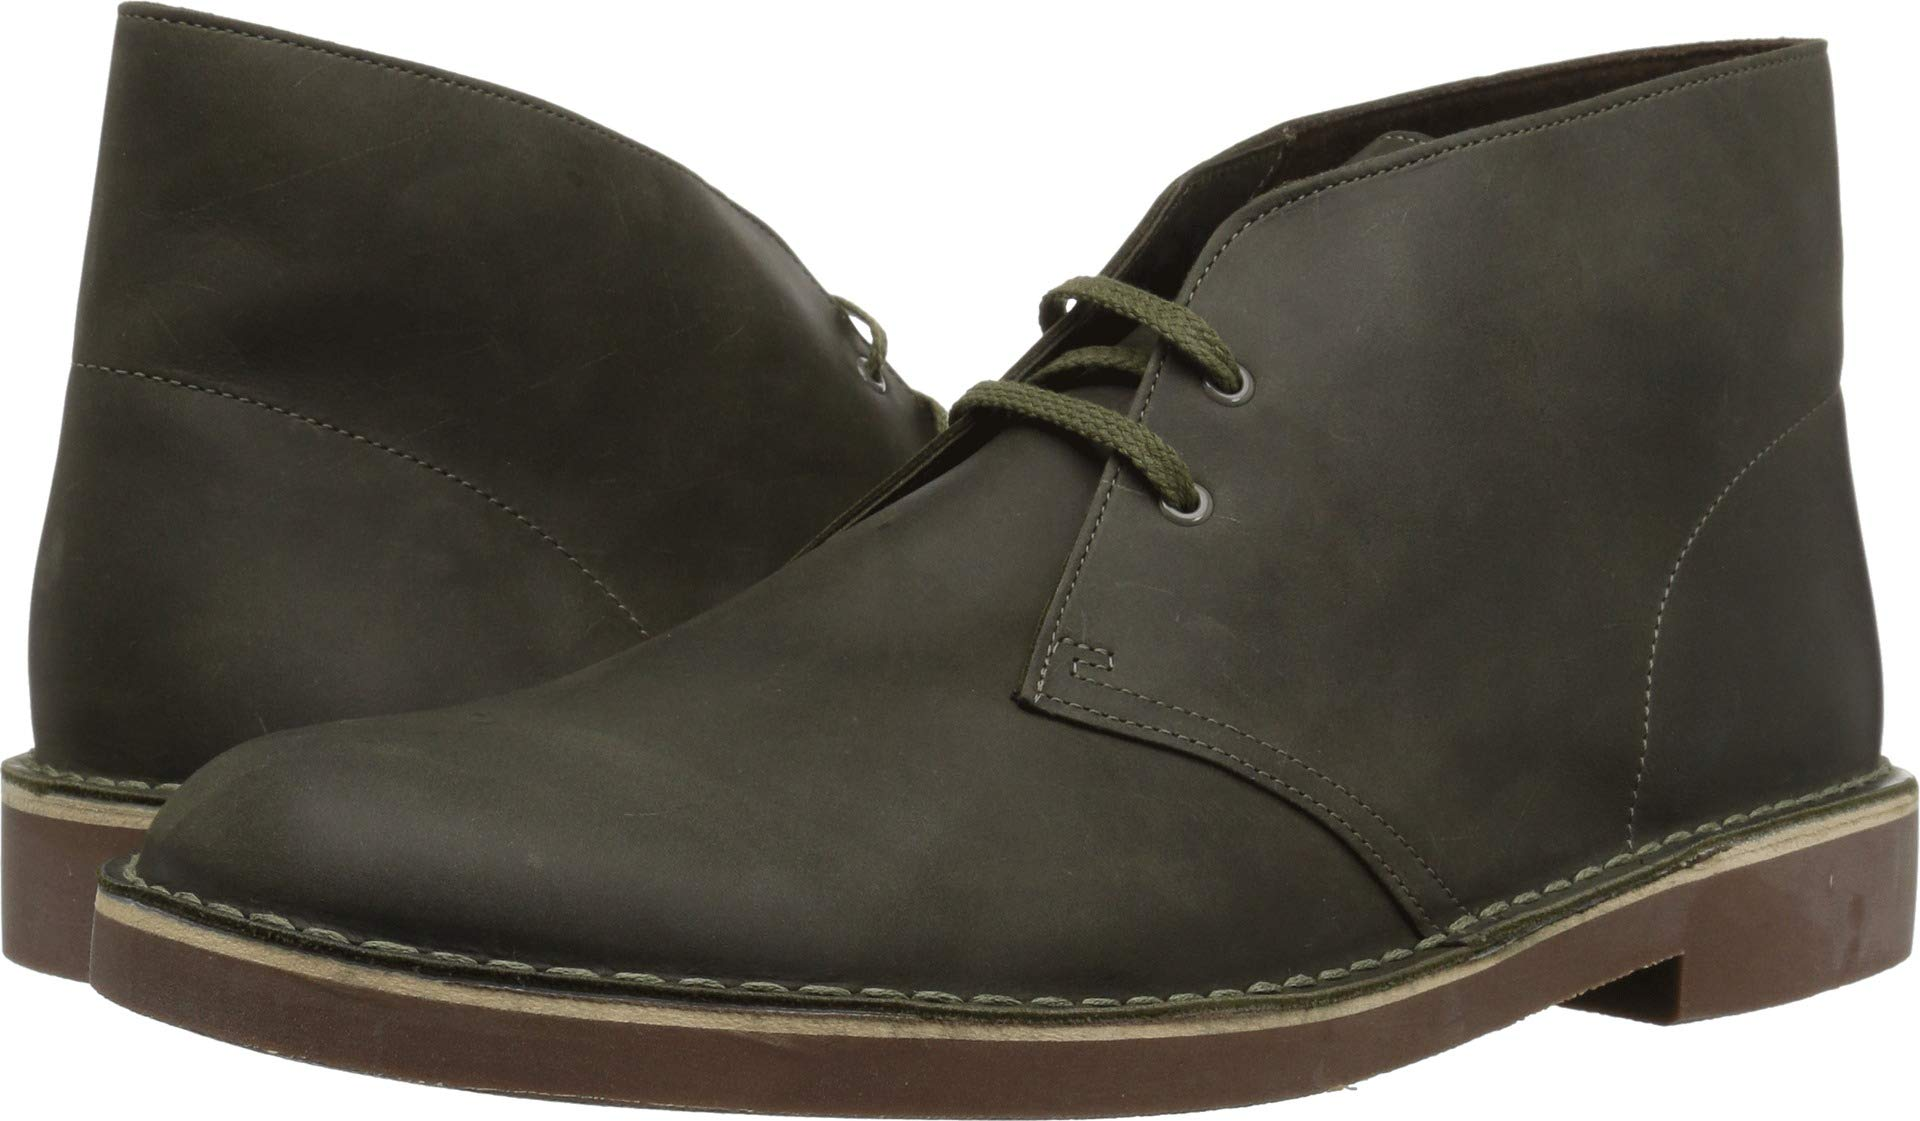 CLARKS Men's Bushacre 2 Boot, Dark Olive Leather, 075 M US